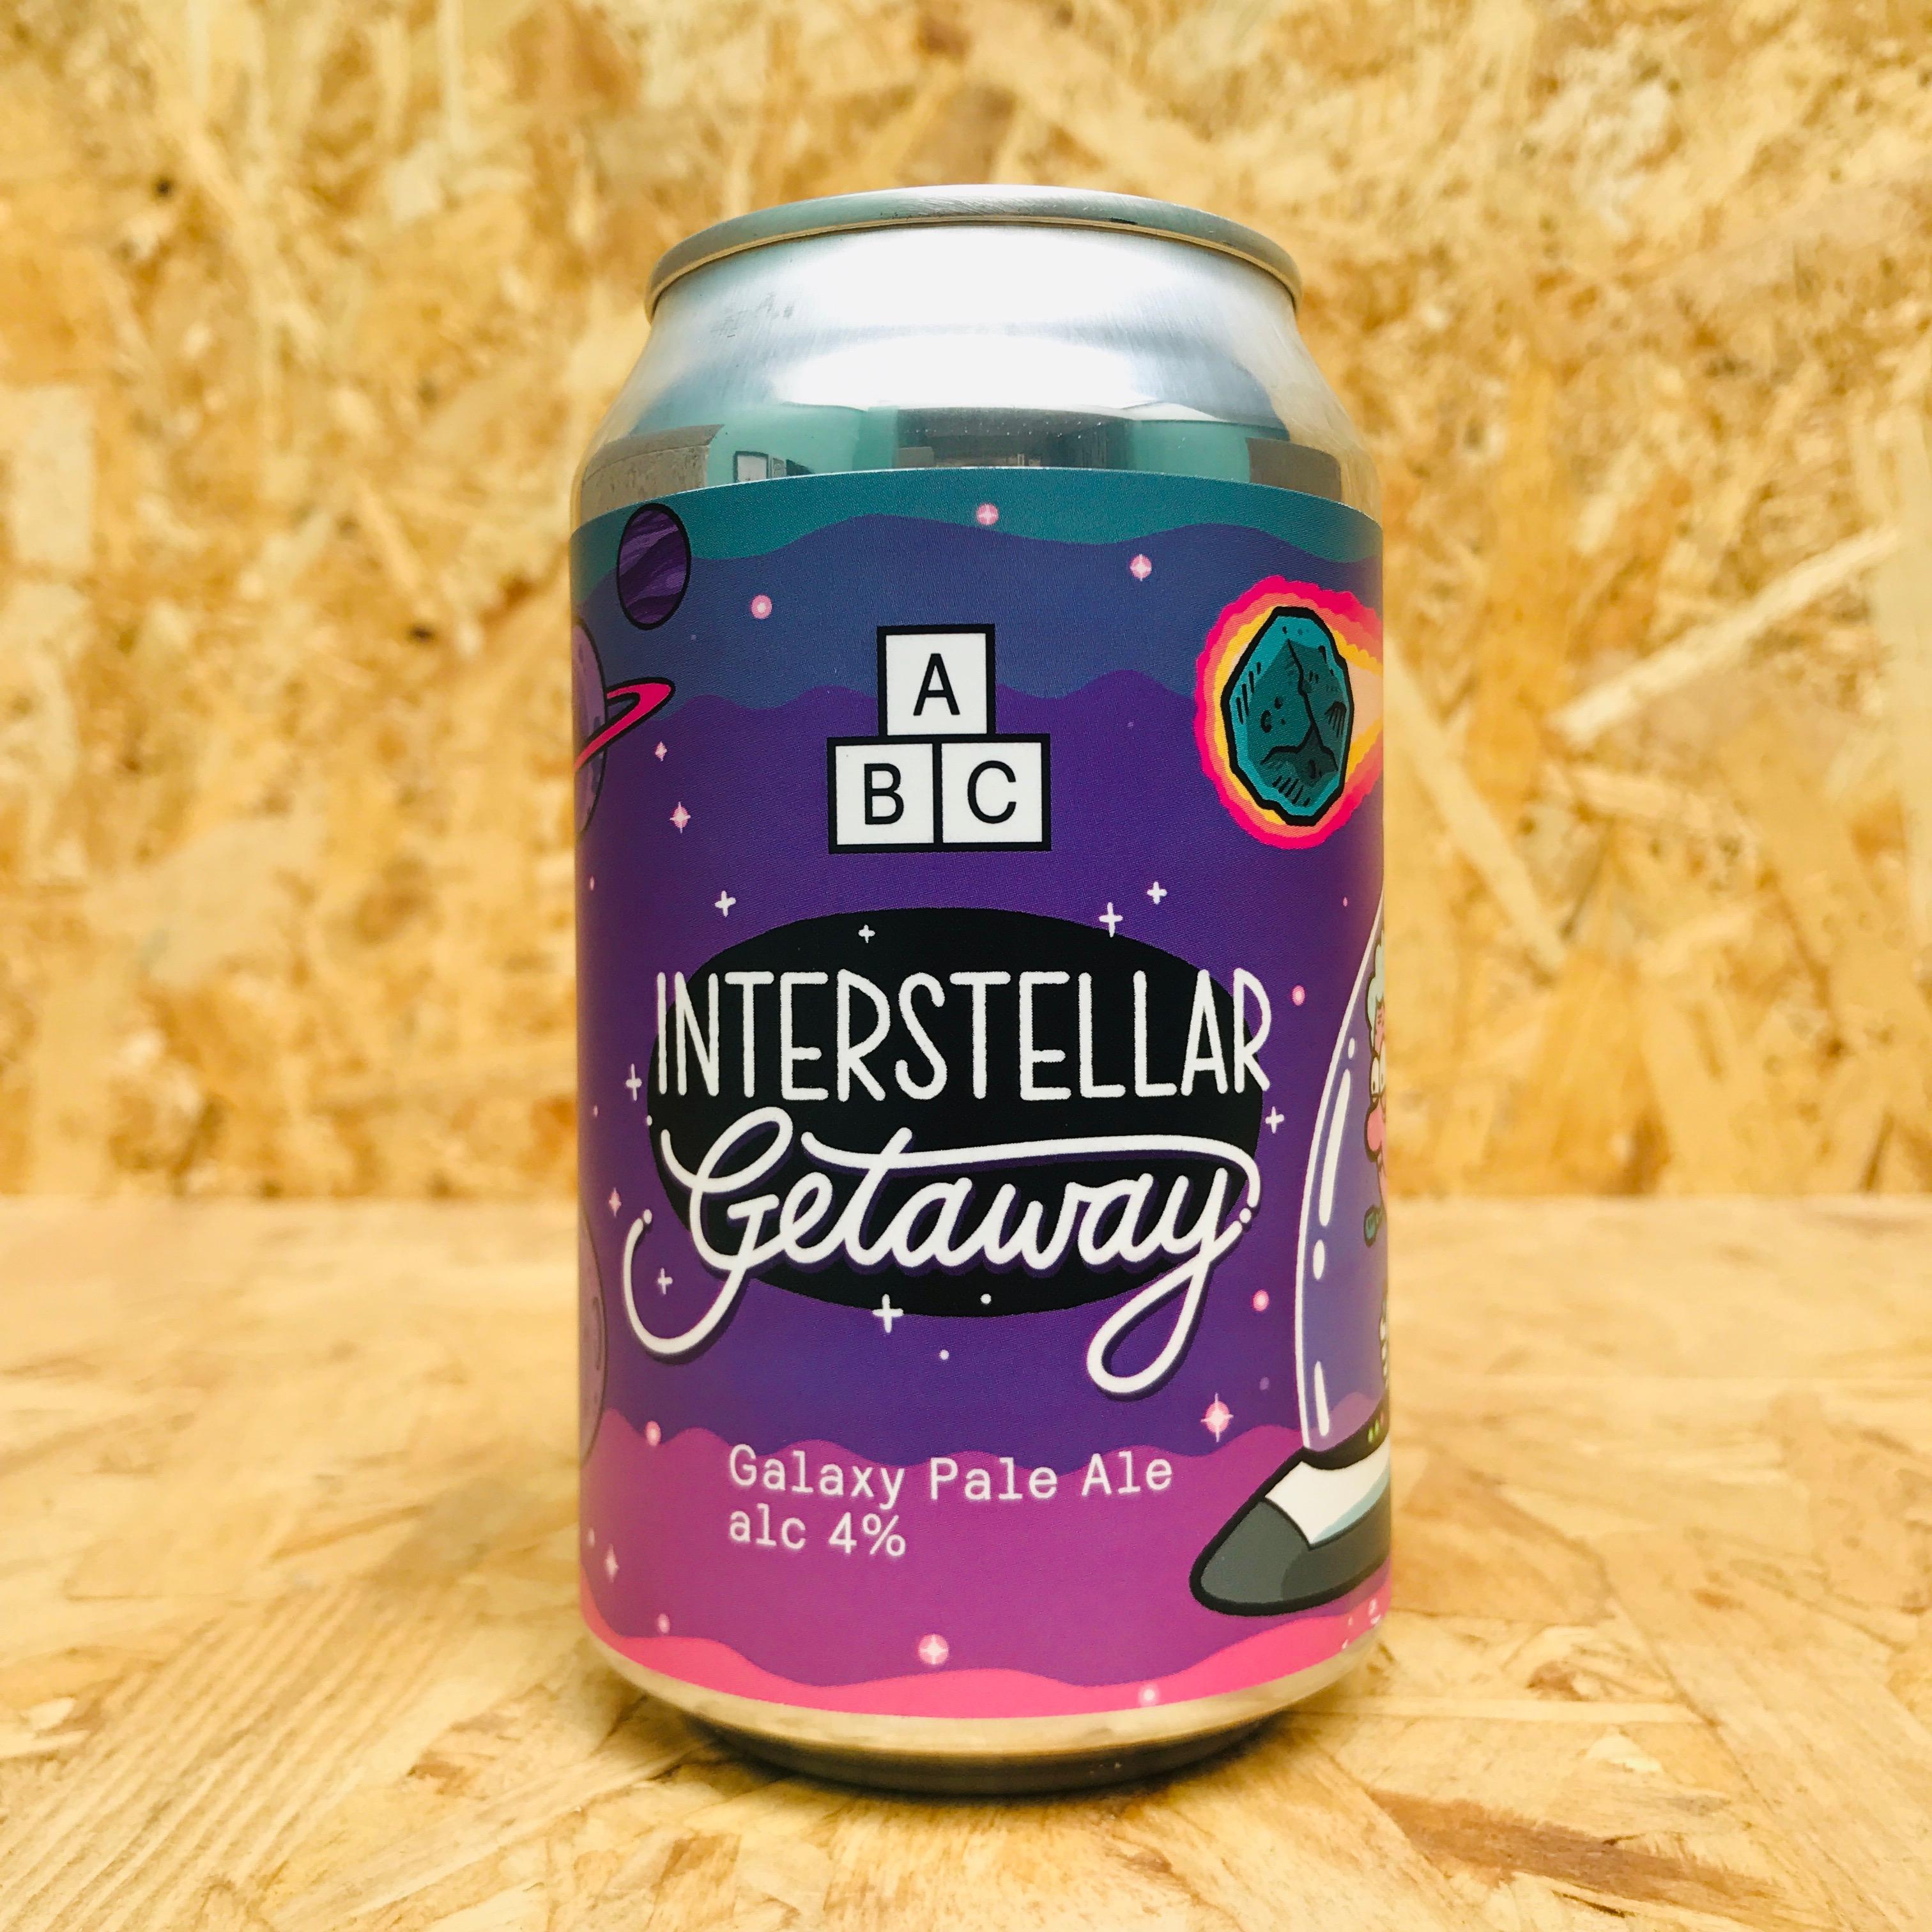 Alphabet - Interstellar Getaway